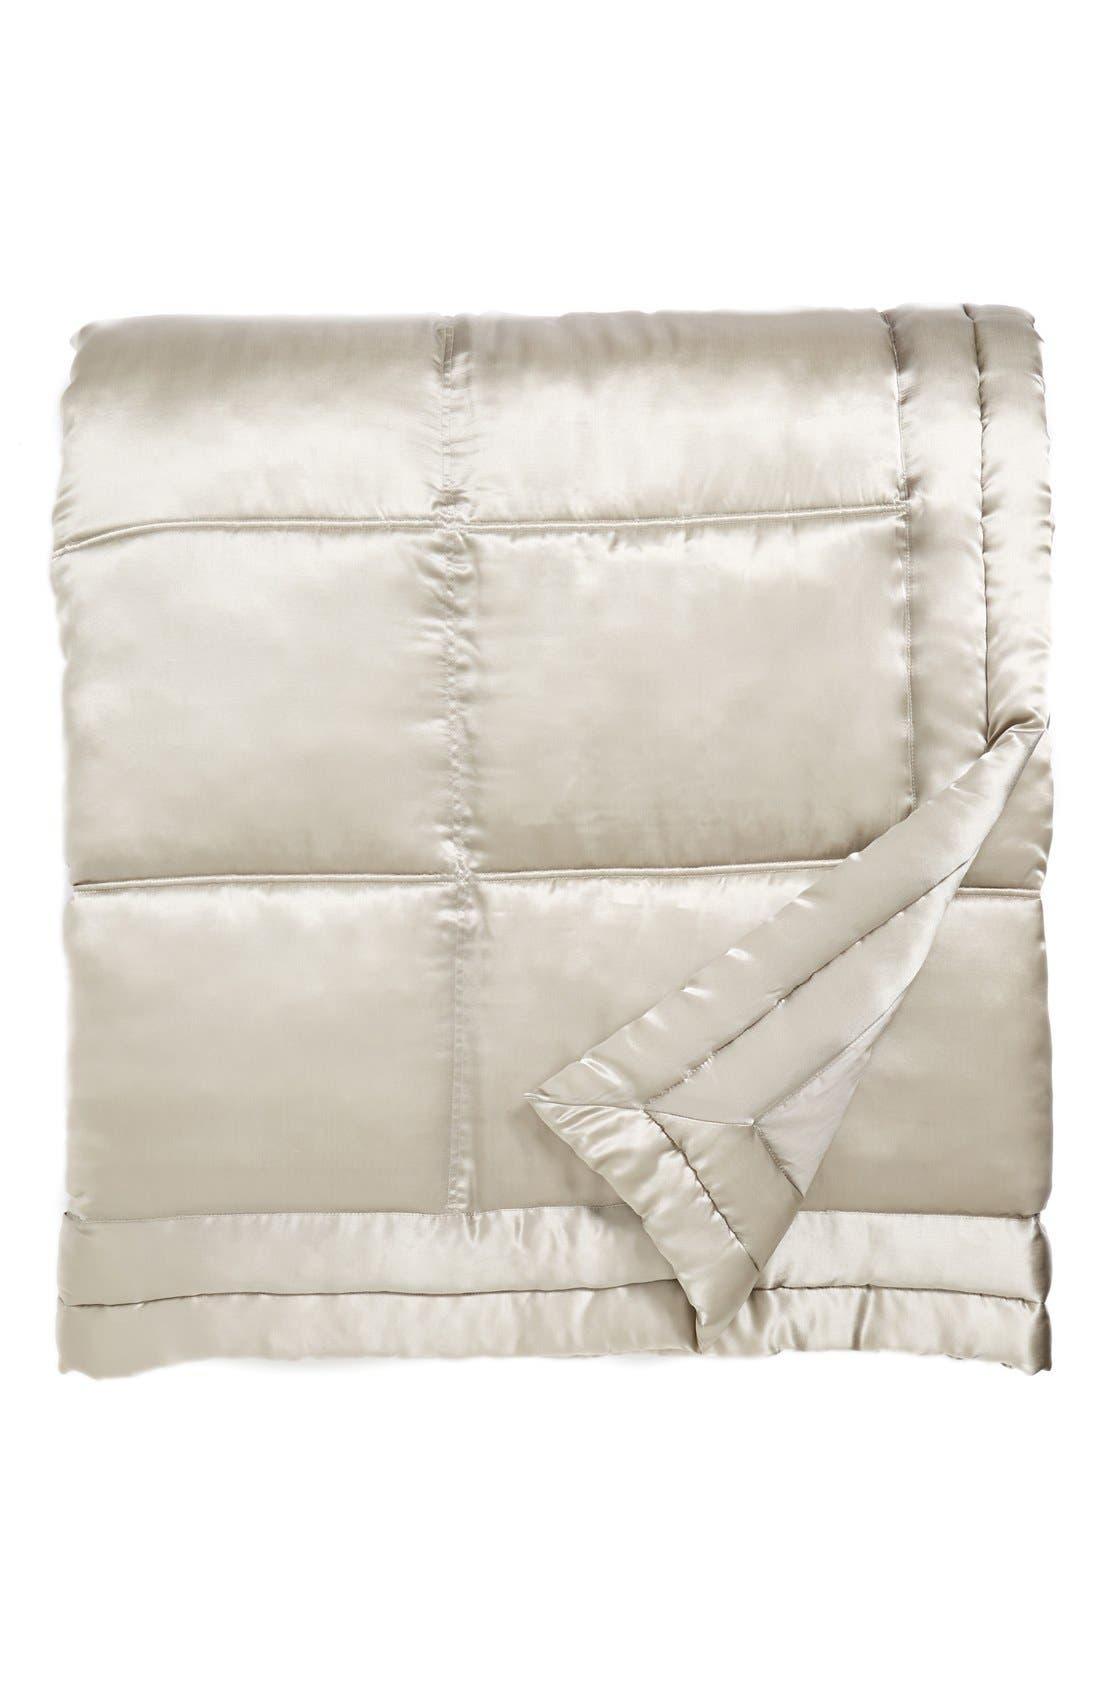 Donna Karan Collection 'Reflection' Silk Charmeuse Quilt,                         Main,                         color, 040